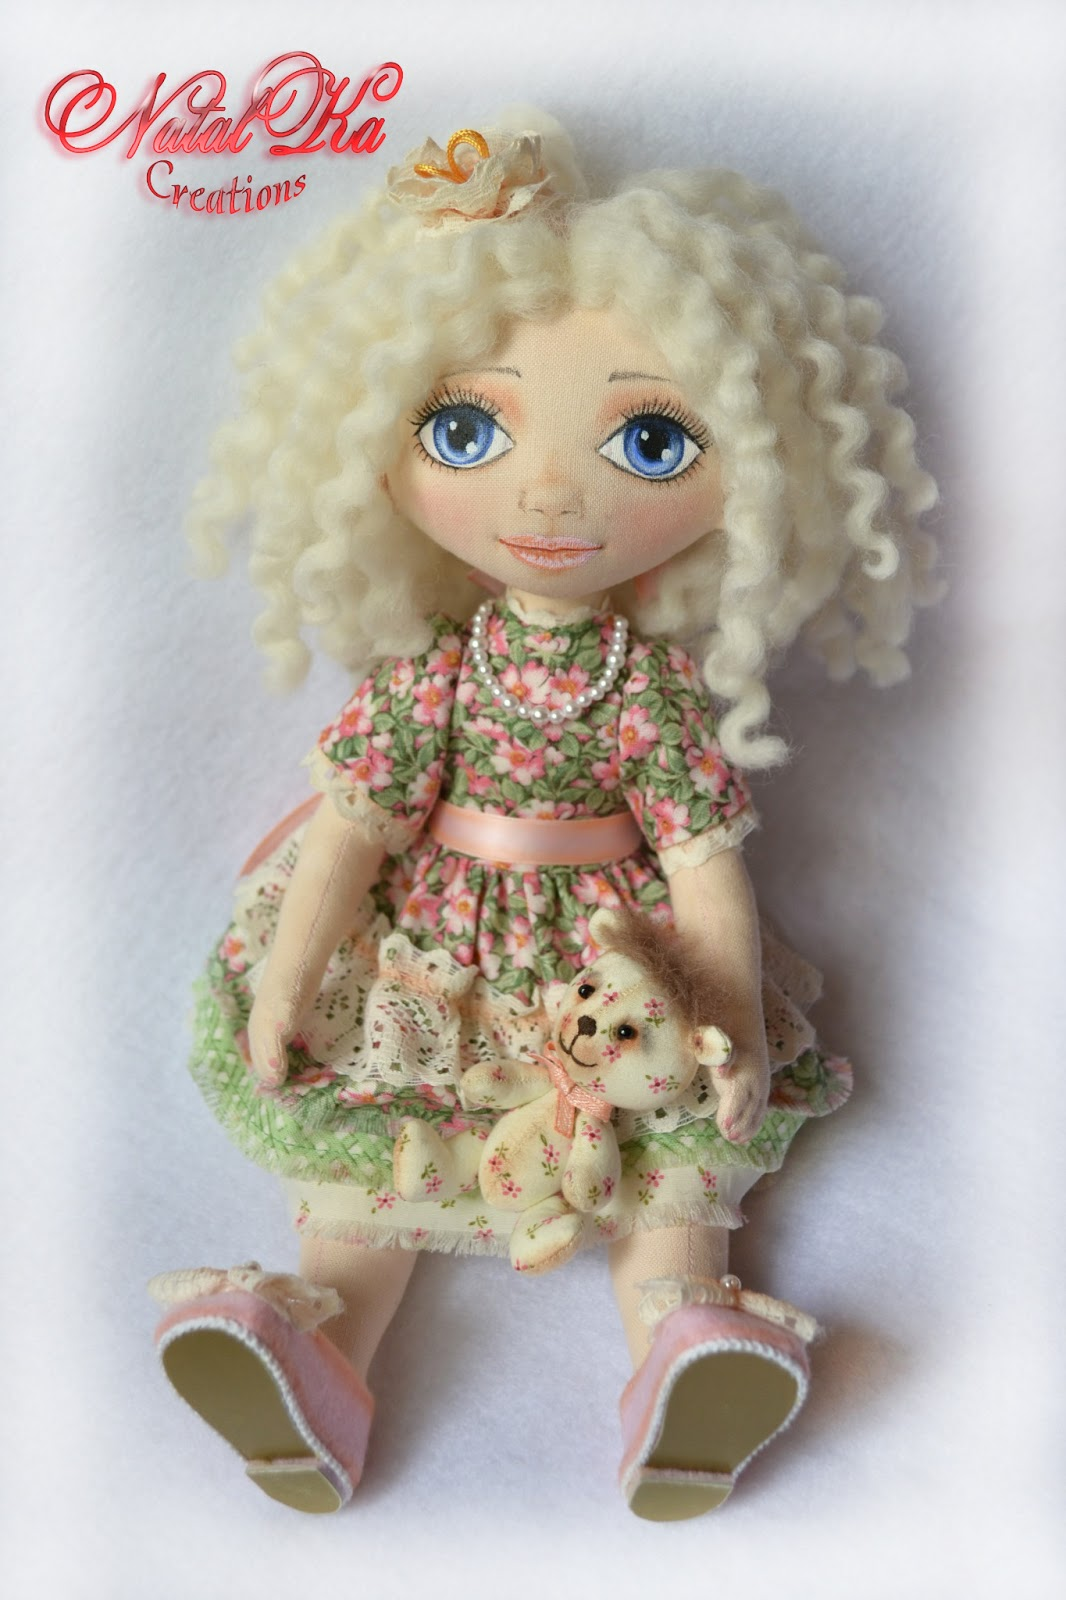 Авторская текстильная кукла. Handgemachte Stoffpuppe von NatalKa Creations. Cloth art doll handmade by NatalKa Creations